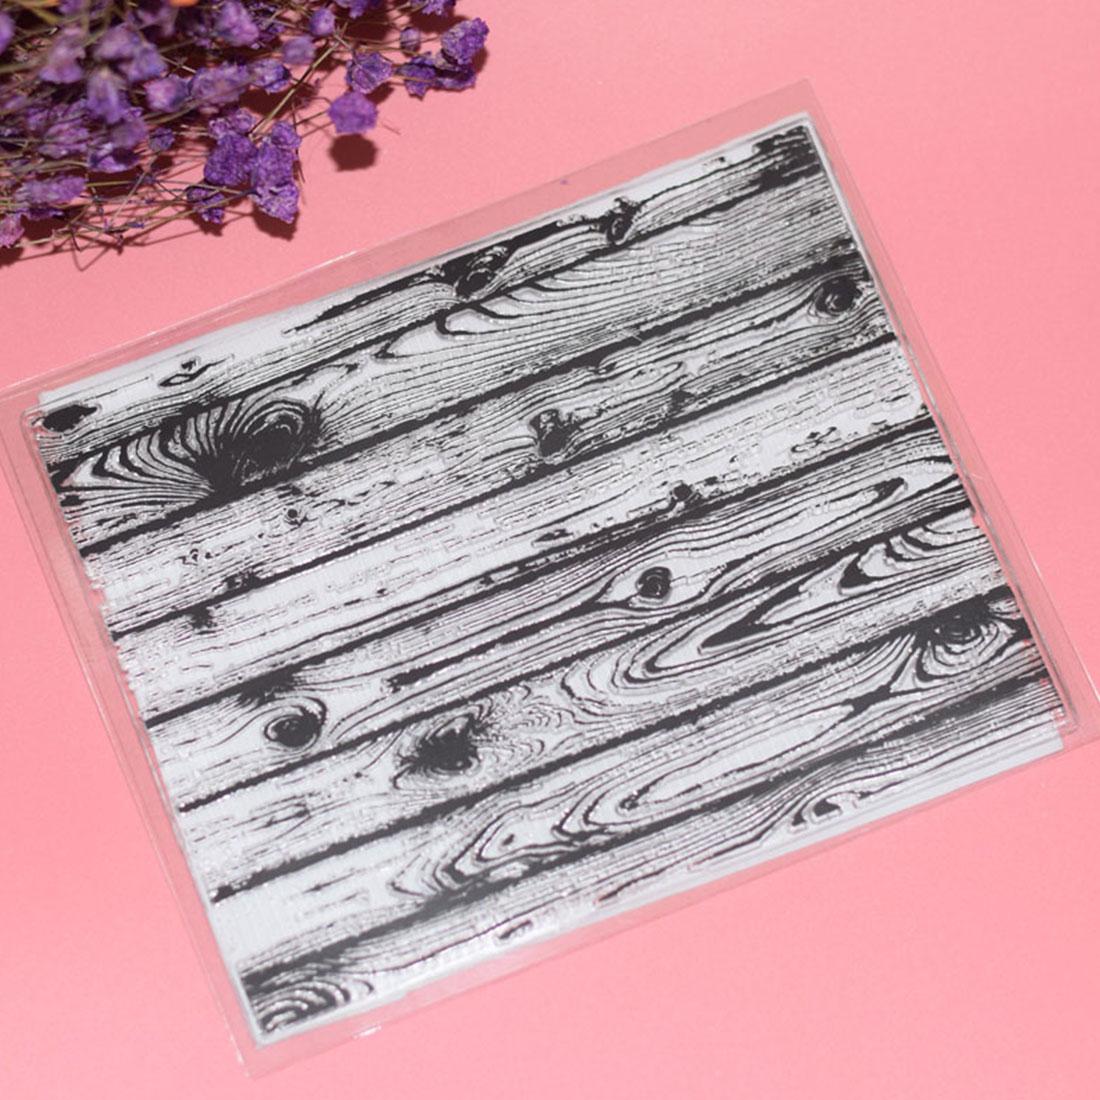 Álbumes de fotos, decoración de suelo de madera, troqueles de sello de caucho transparente, sello artesanal DIY para decoración para álbum de recortes, fabricación de tarjetas